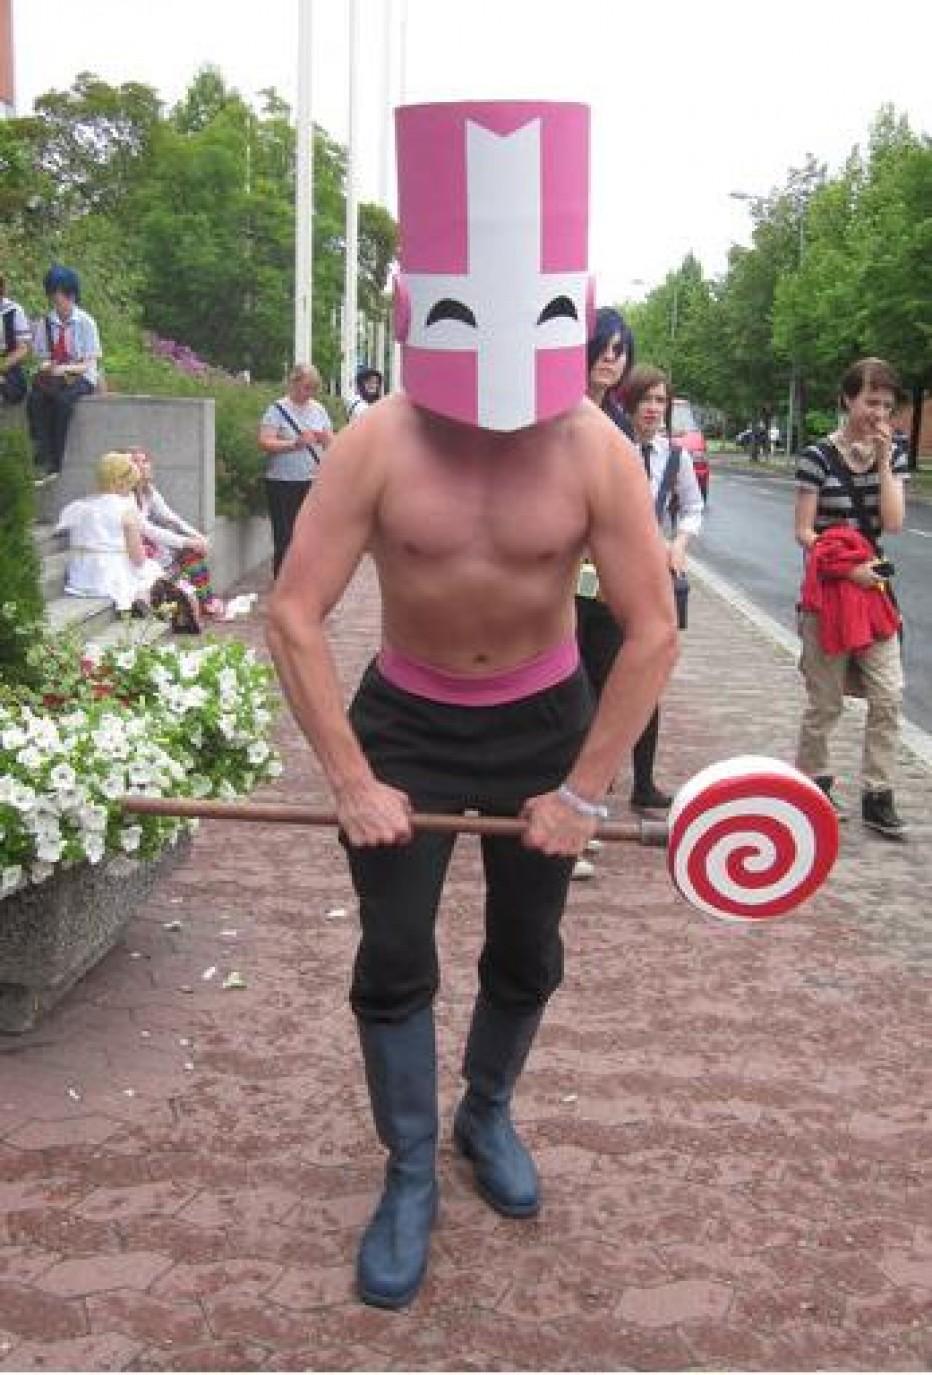 pink_knight_with_lollipop_by_m4rkk4-d7xf1wr1.jpg